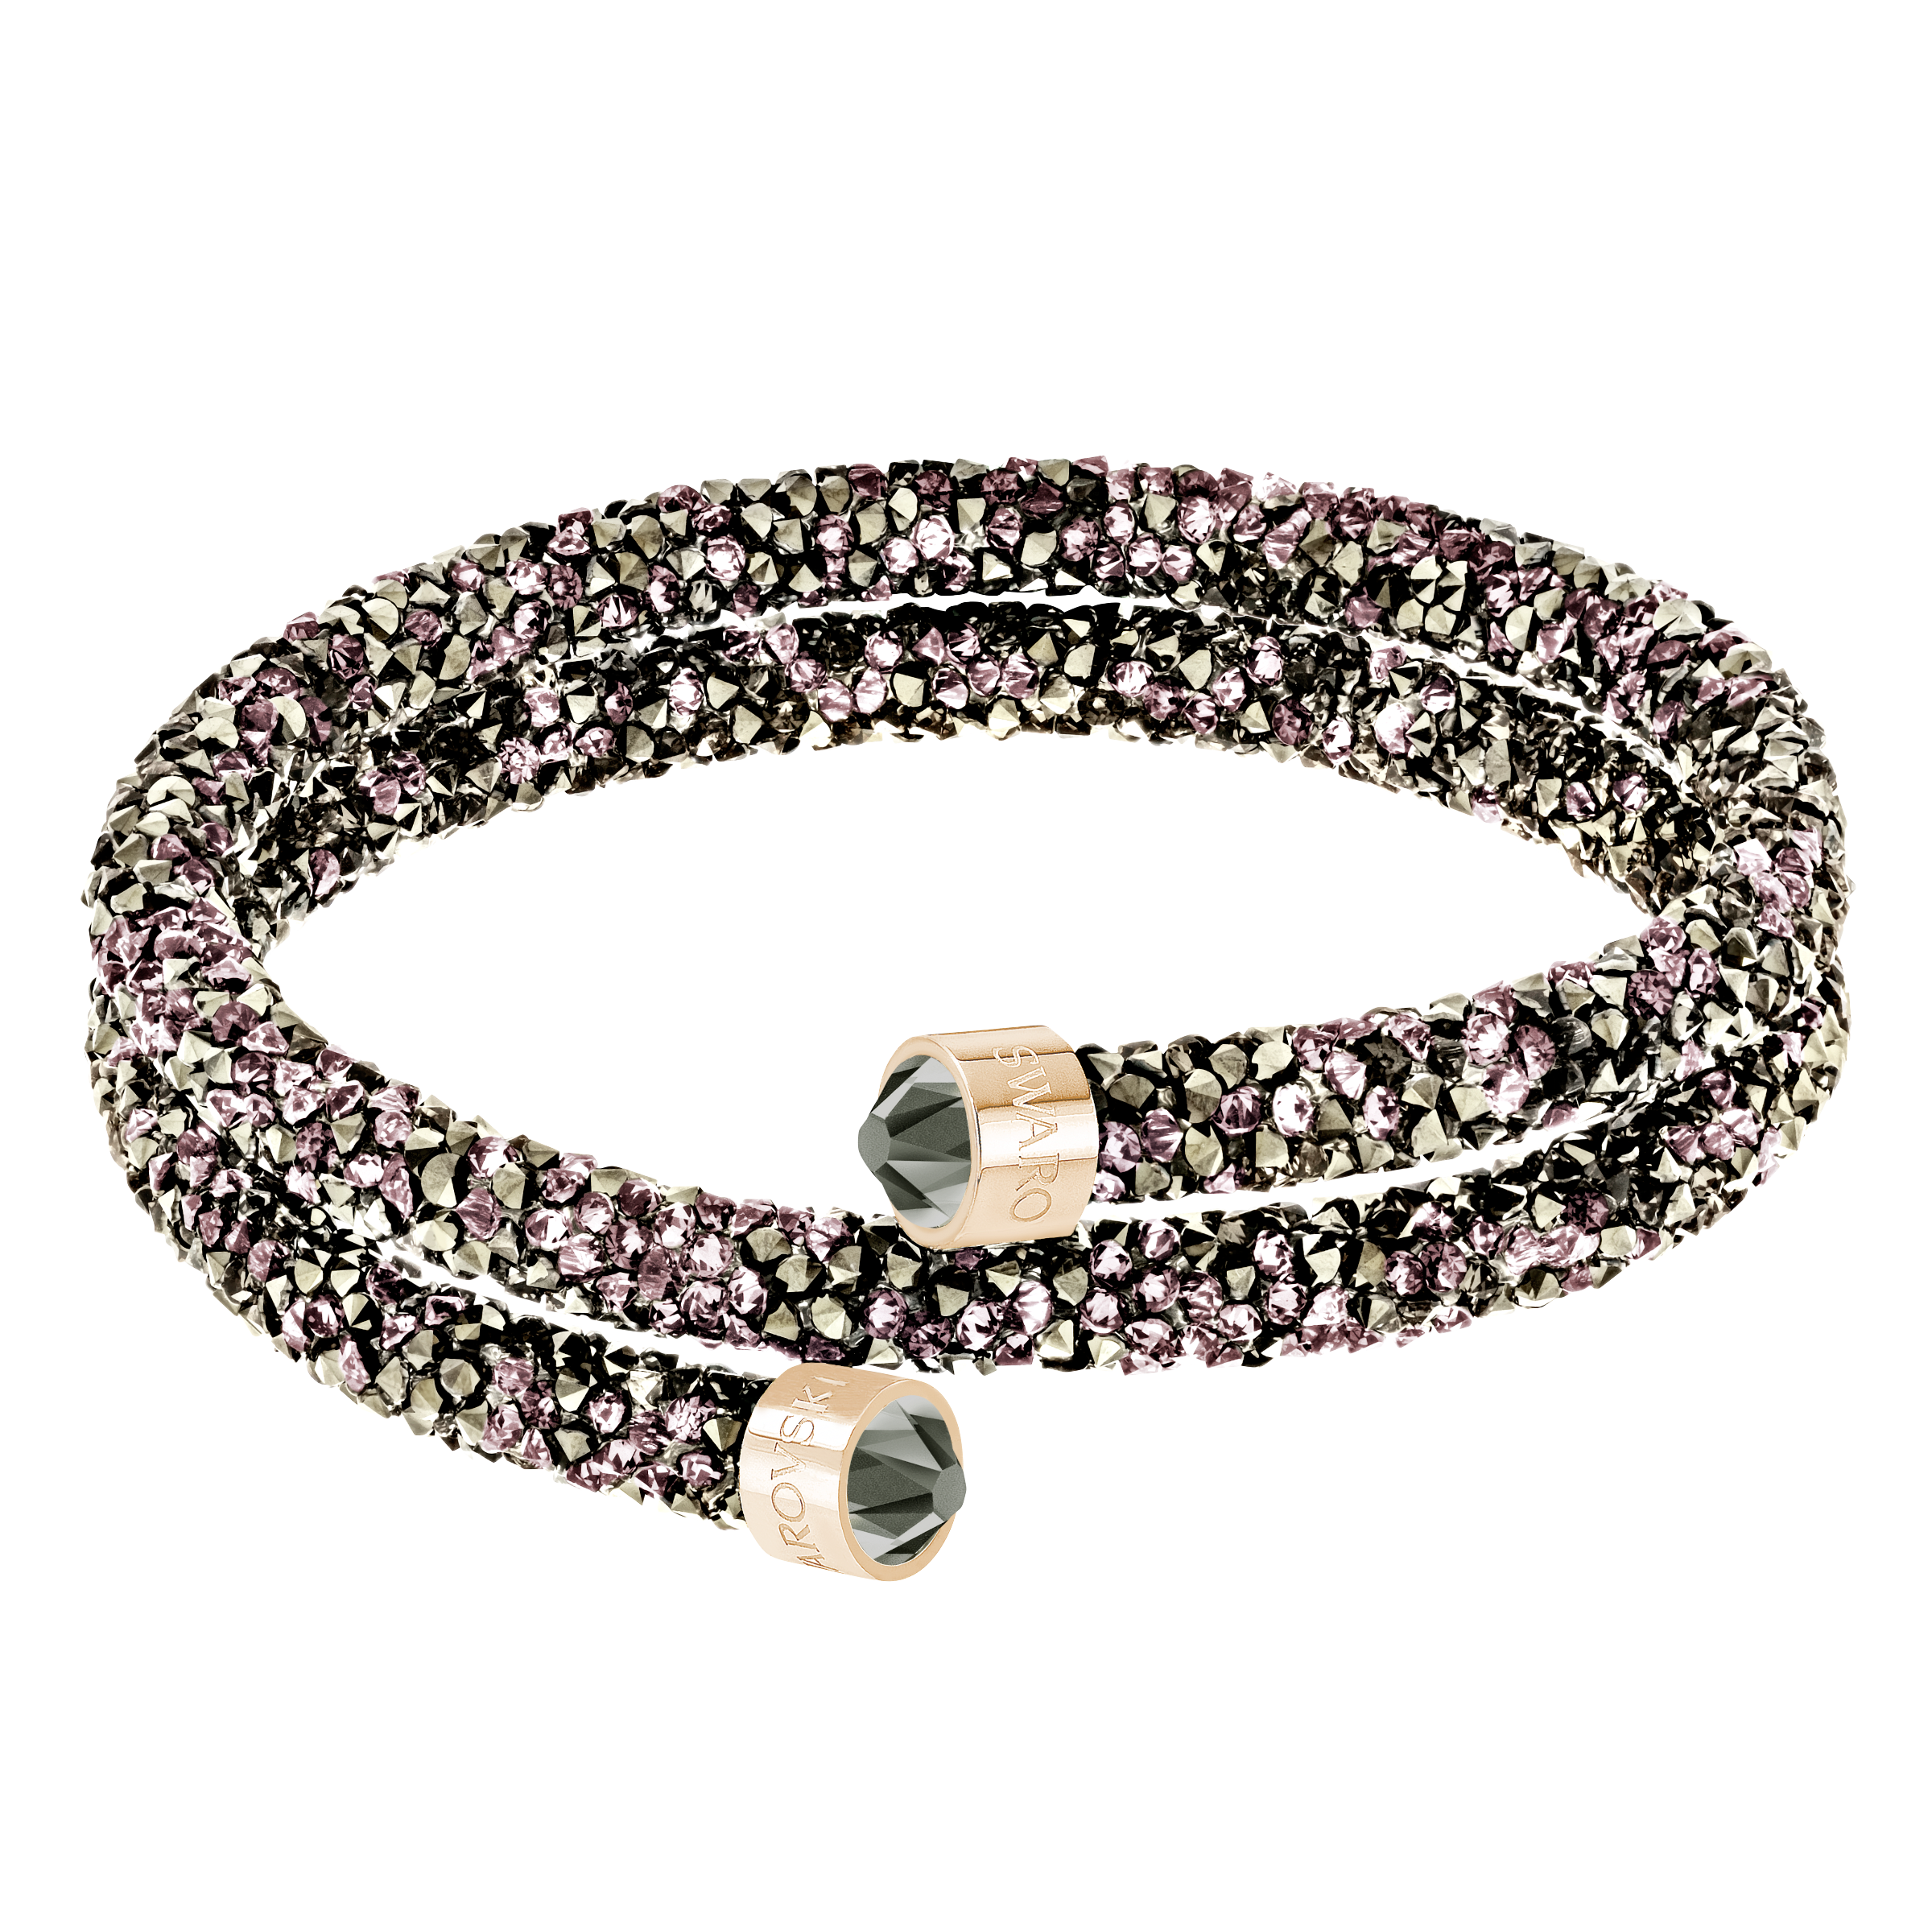 Crystaldust Double Bangle, Multi-colored, Rose-gold tone plated